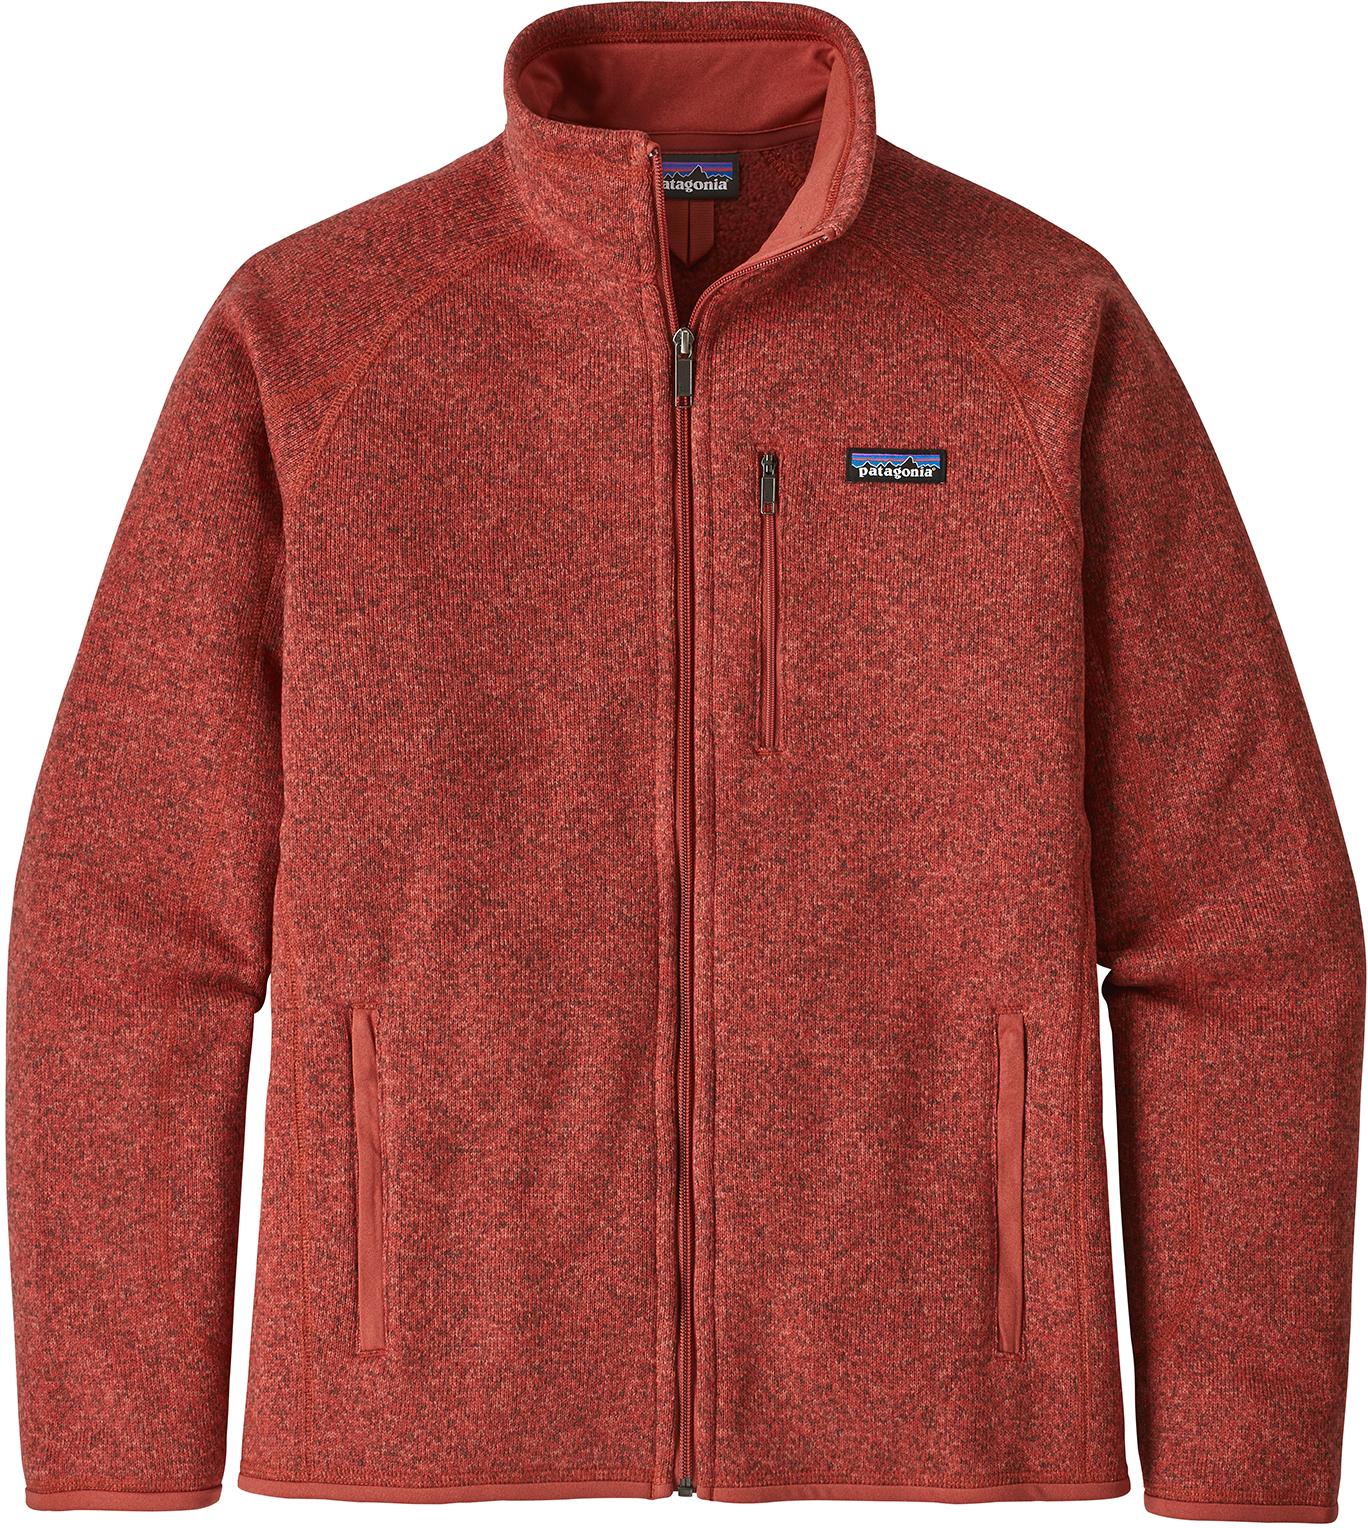 3c8d95202ed Patagonia Better Sweater Jacket - Men's